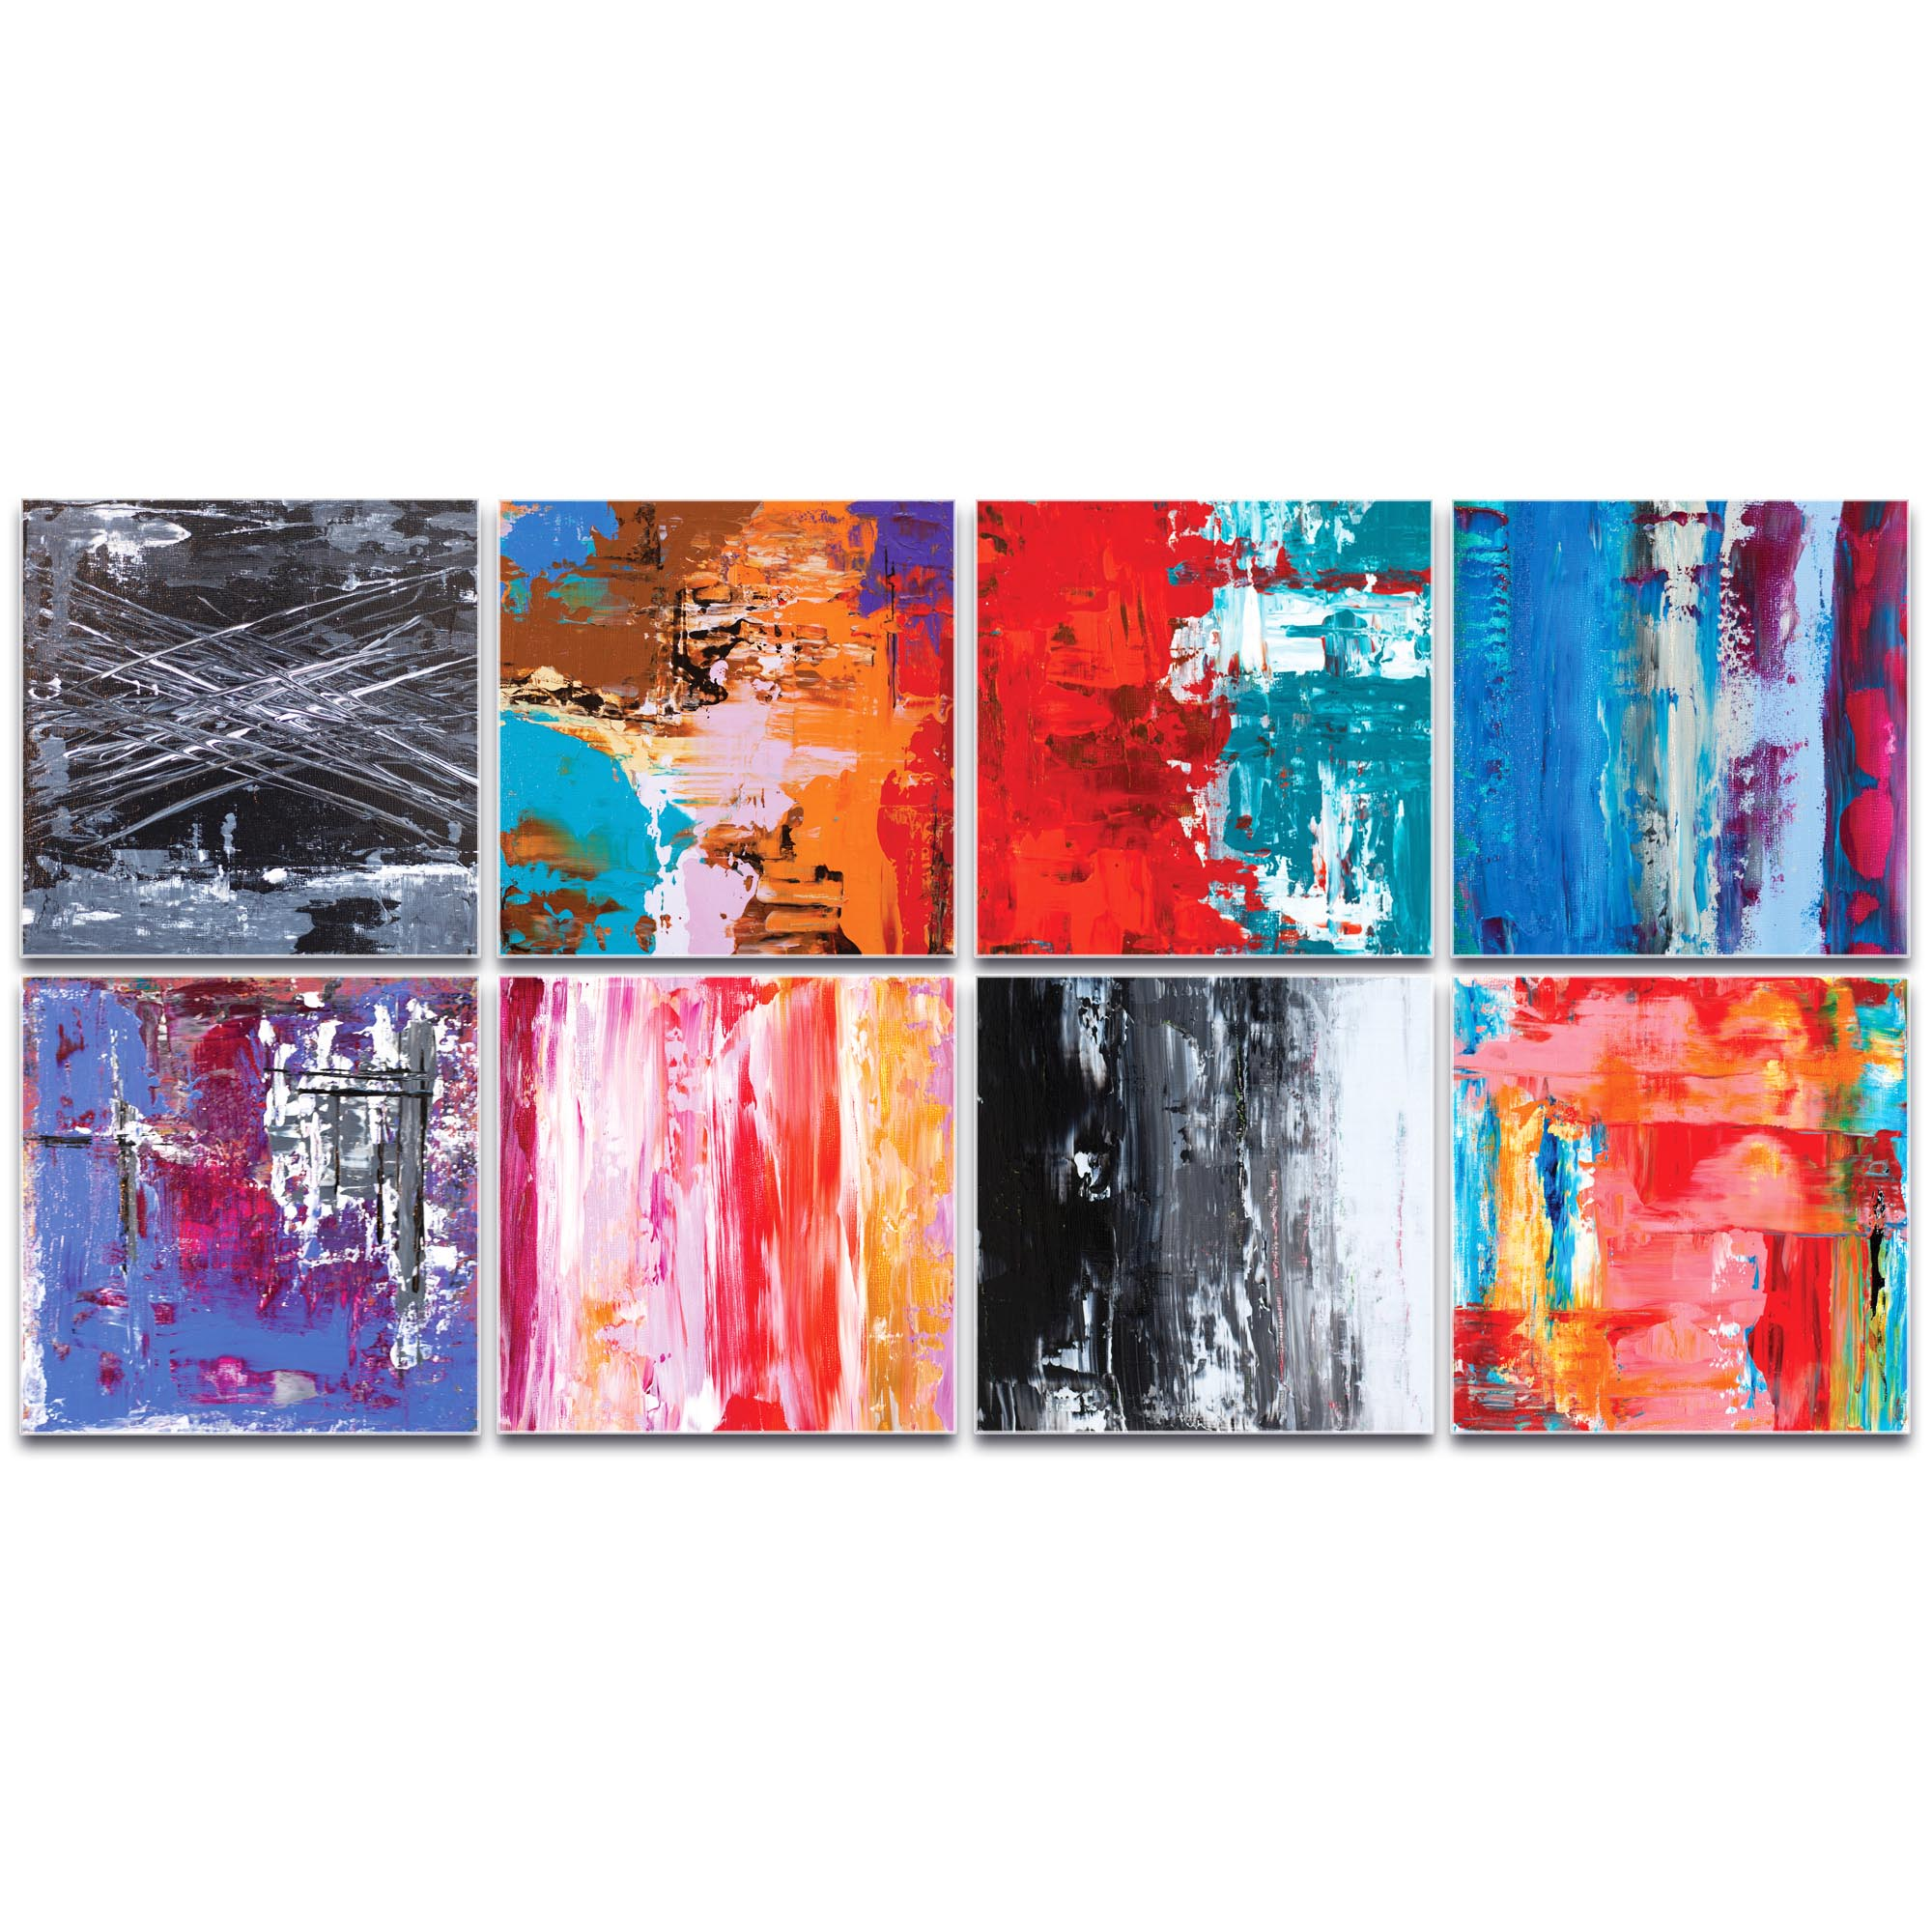 Abstract Wall Art 'Urban Windows Large' - Urban Decor on Metal or Plexiglass - Image 2